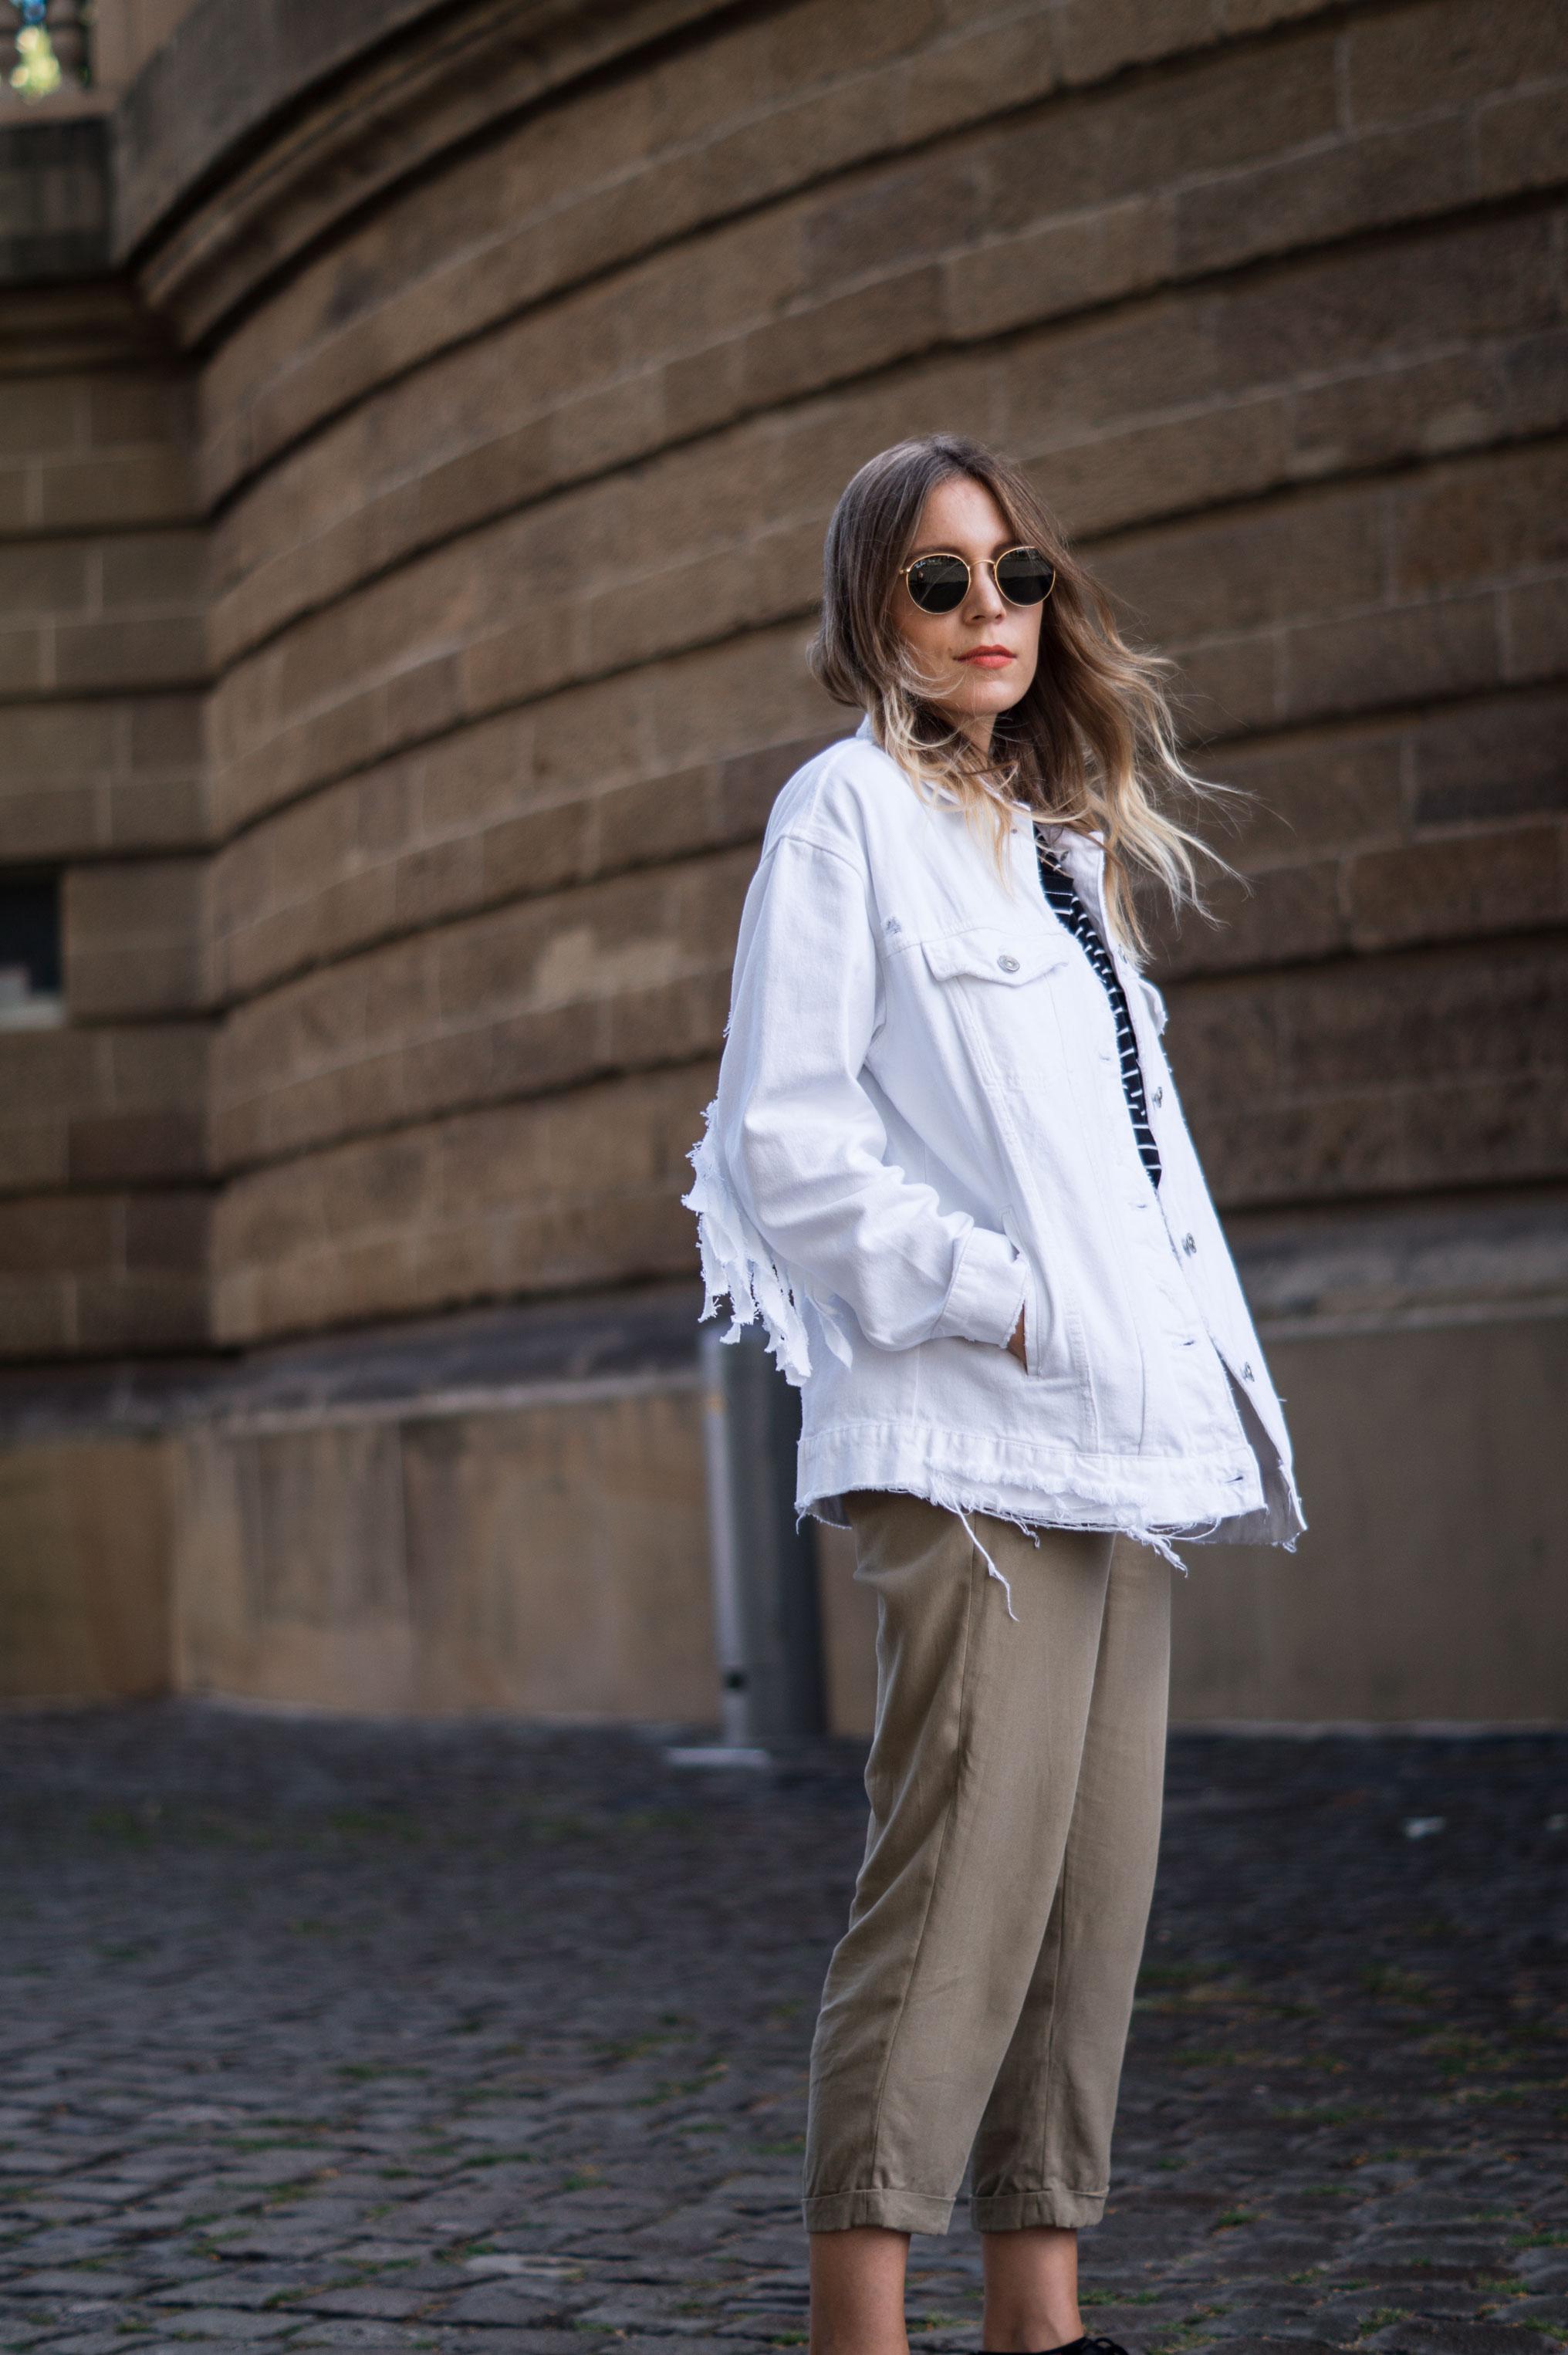 Fringed Denim Jacket Fransenjacke weiße Jeansjacke Casual Outfit Sariety Fashionblogger Modeblog Heidelberg Mannheim Wasserturm-4